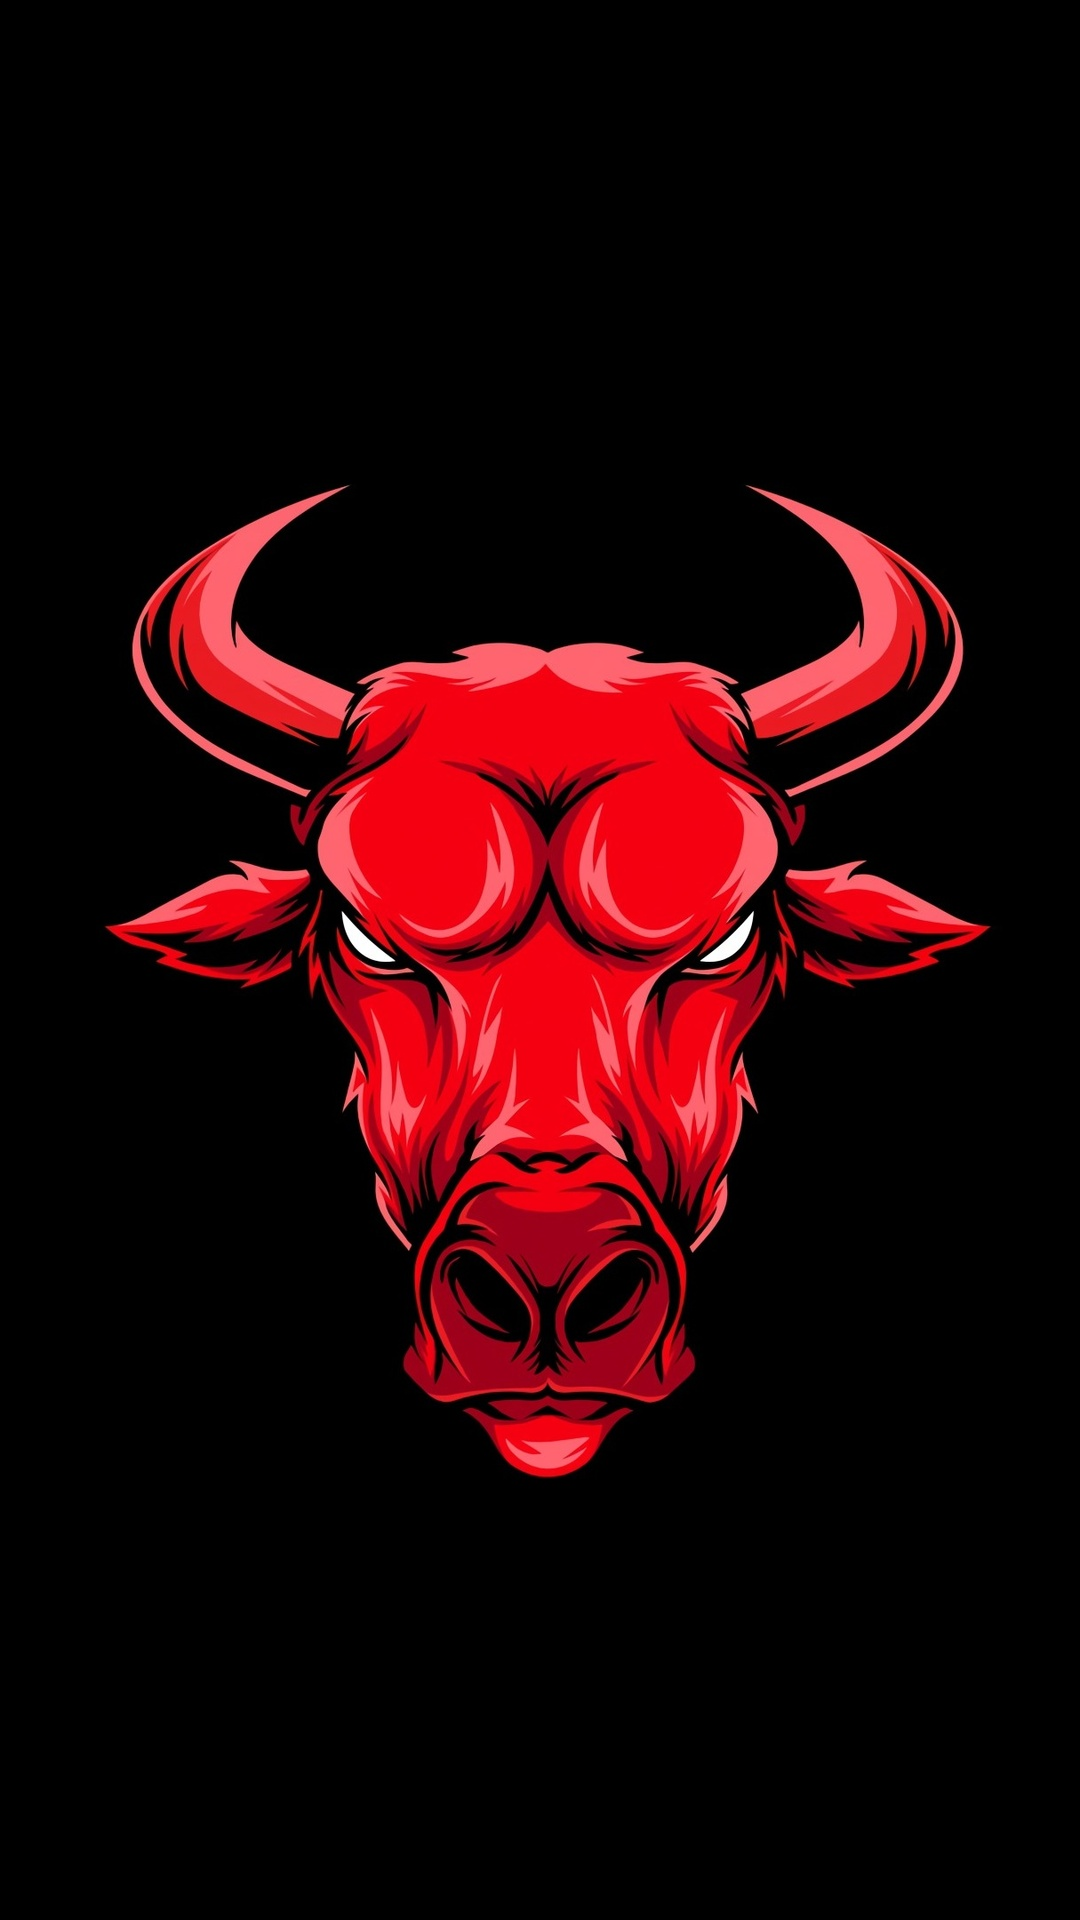 Iphone 7 Red Bull Wallpaper